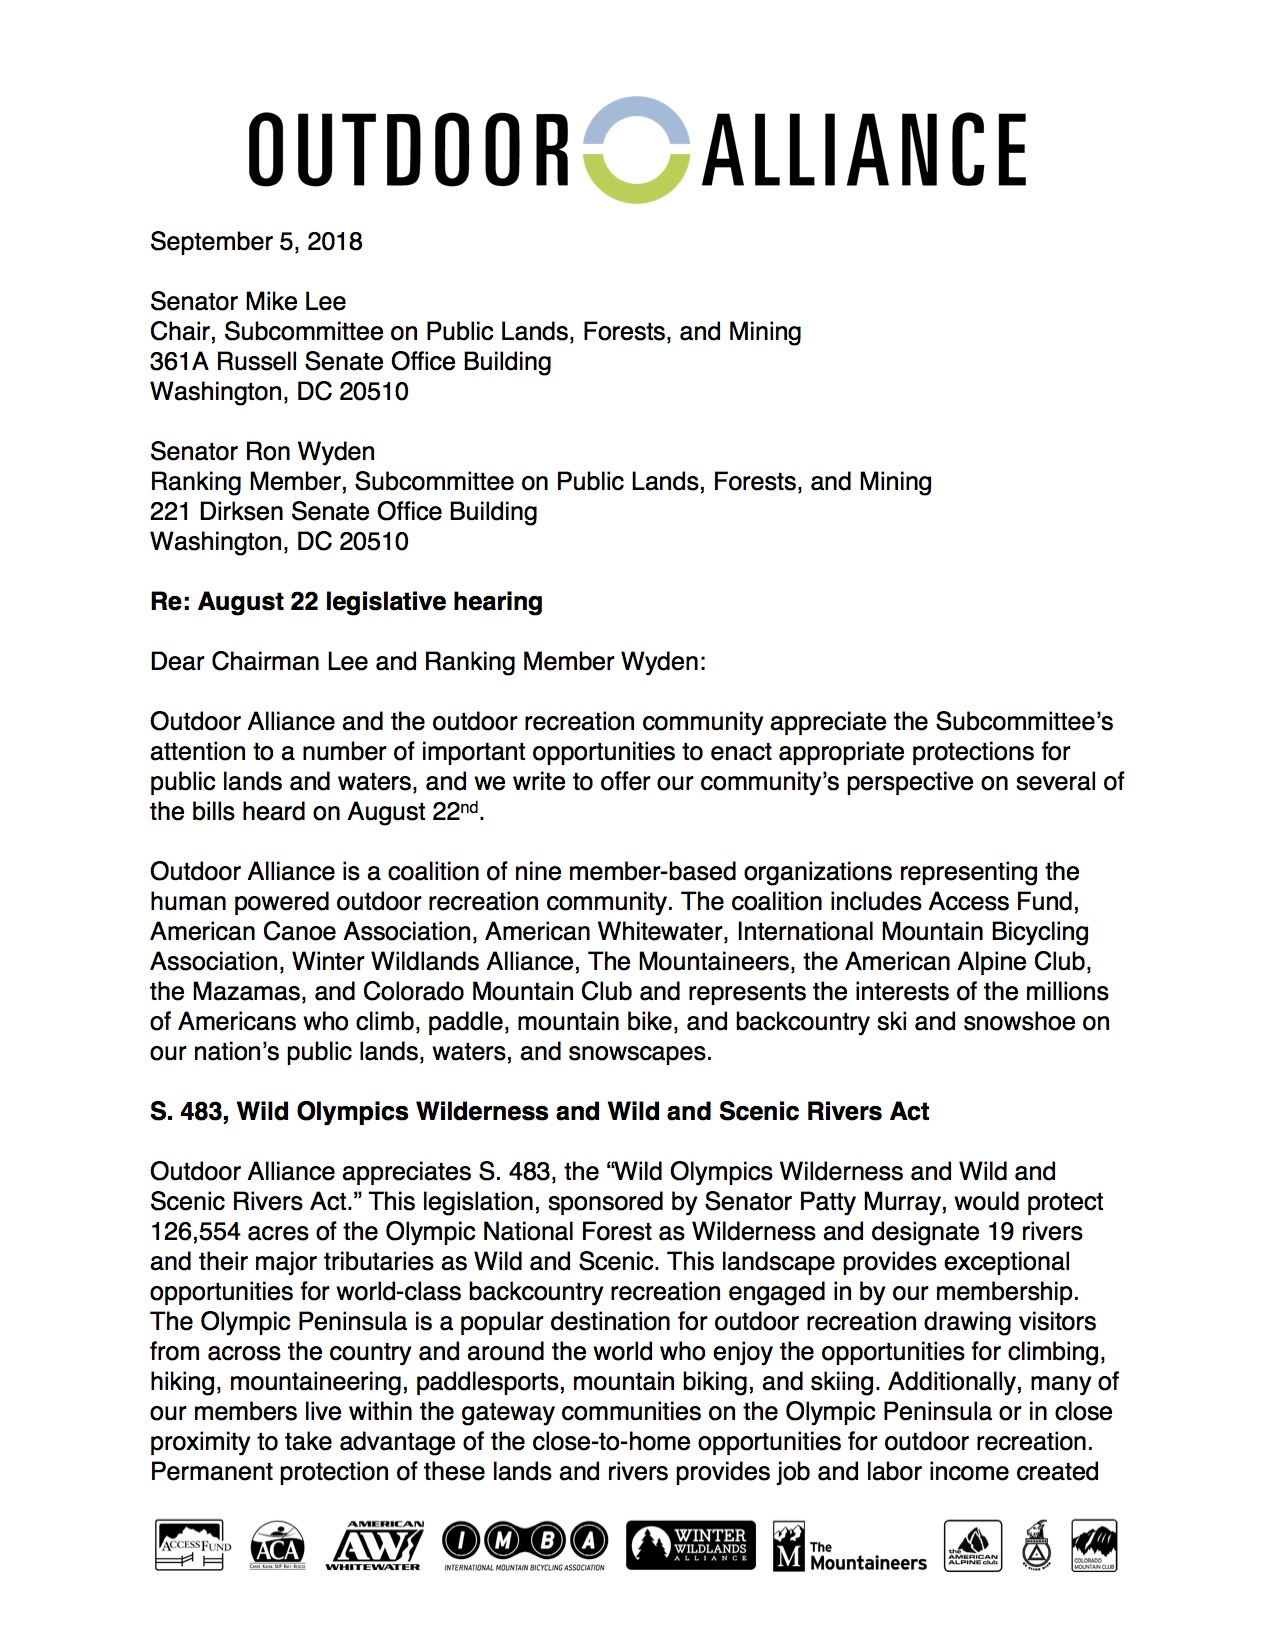 OA testimony ENR hearing 8-22 copy.jpg